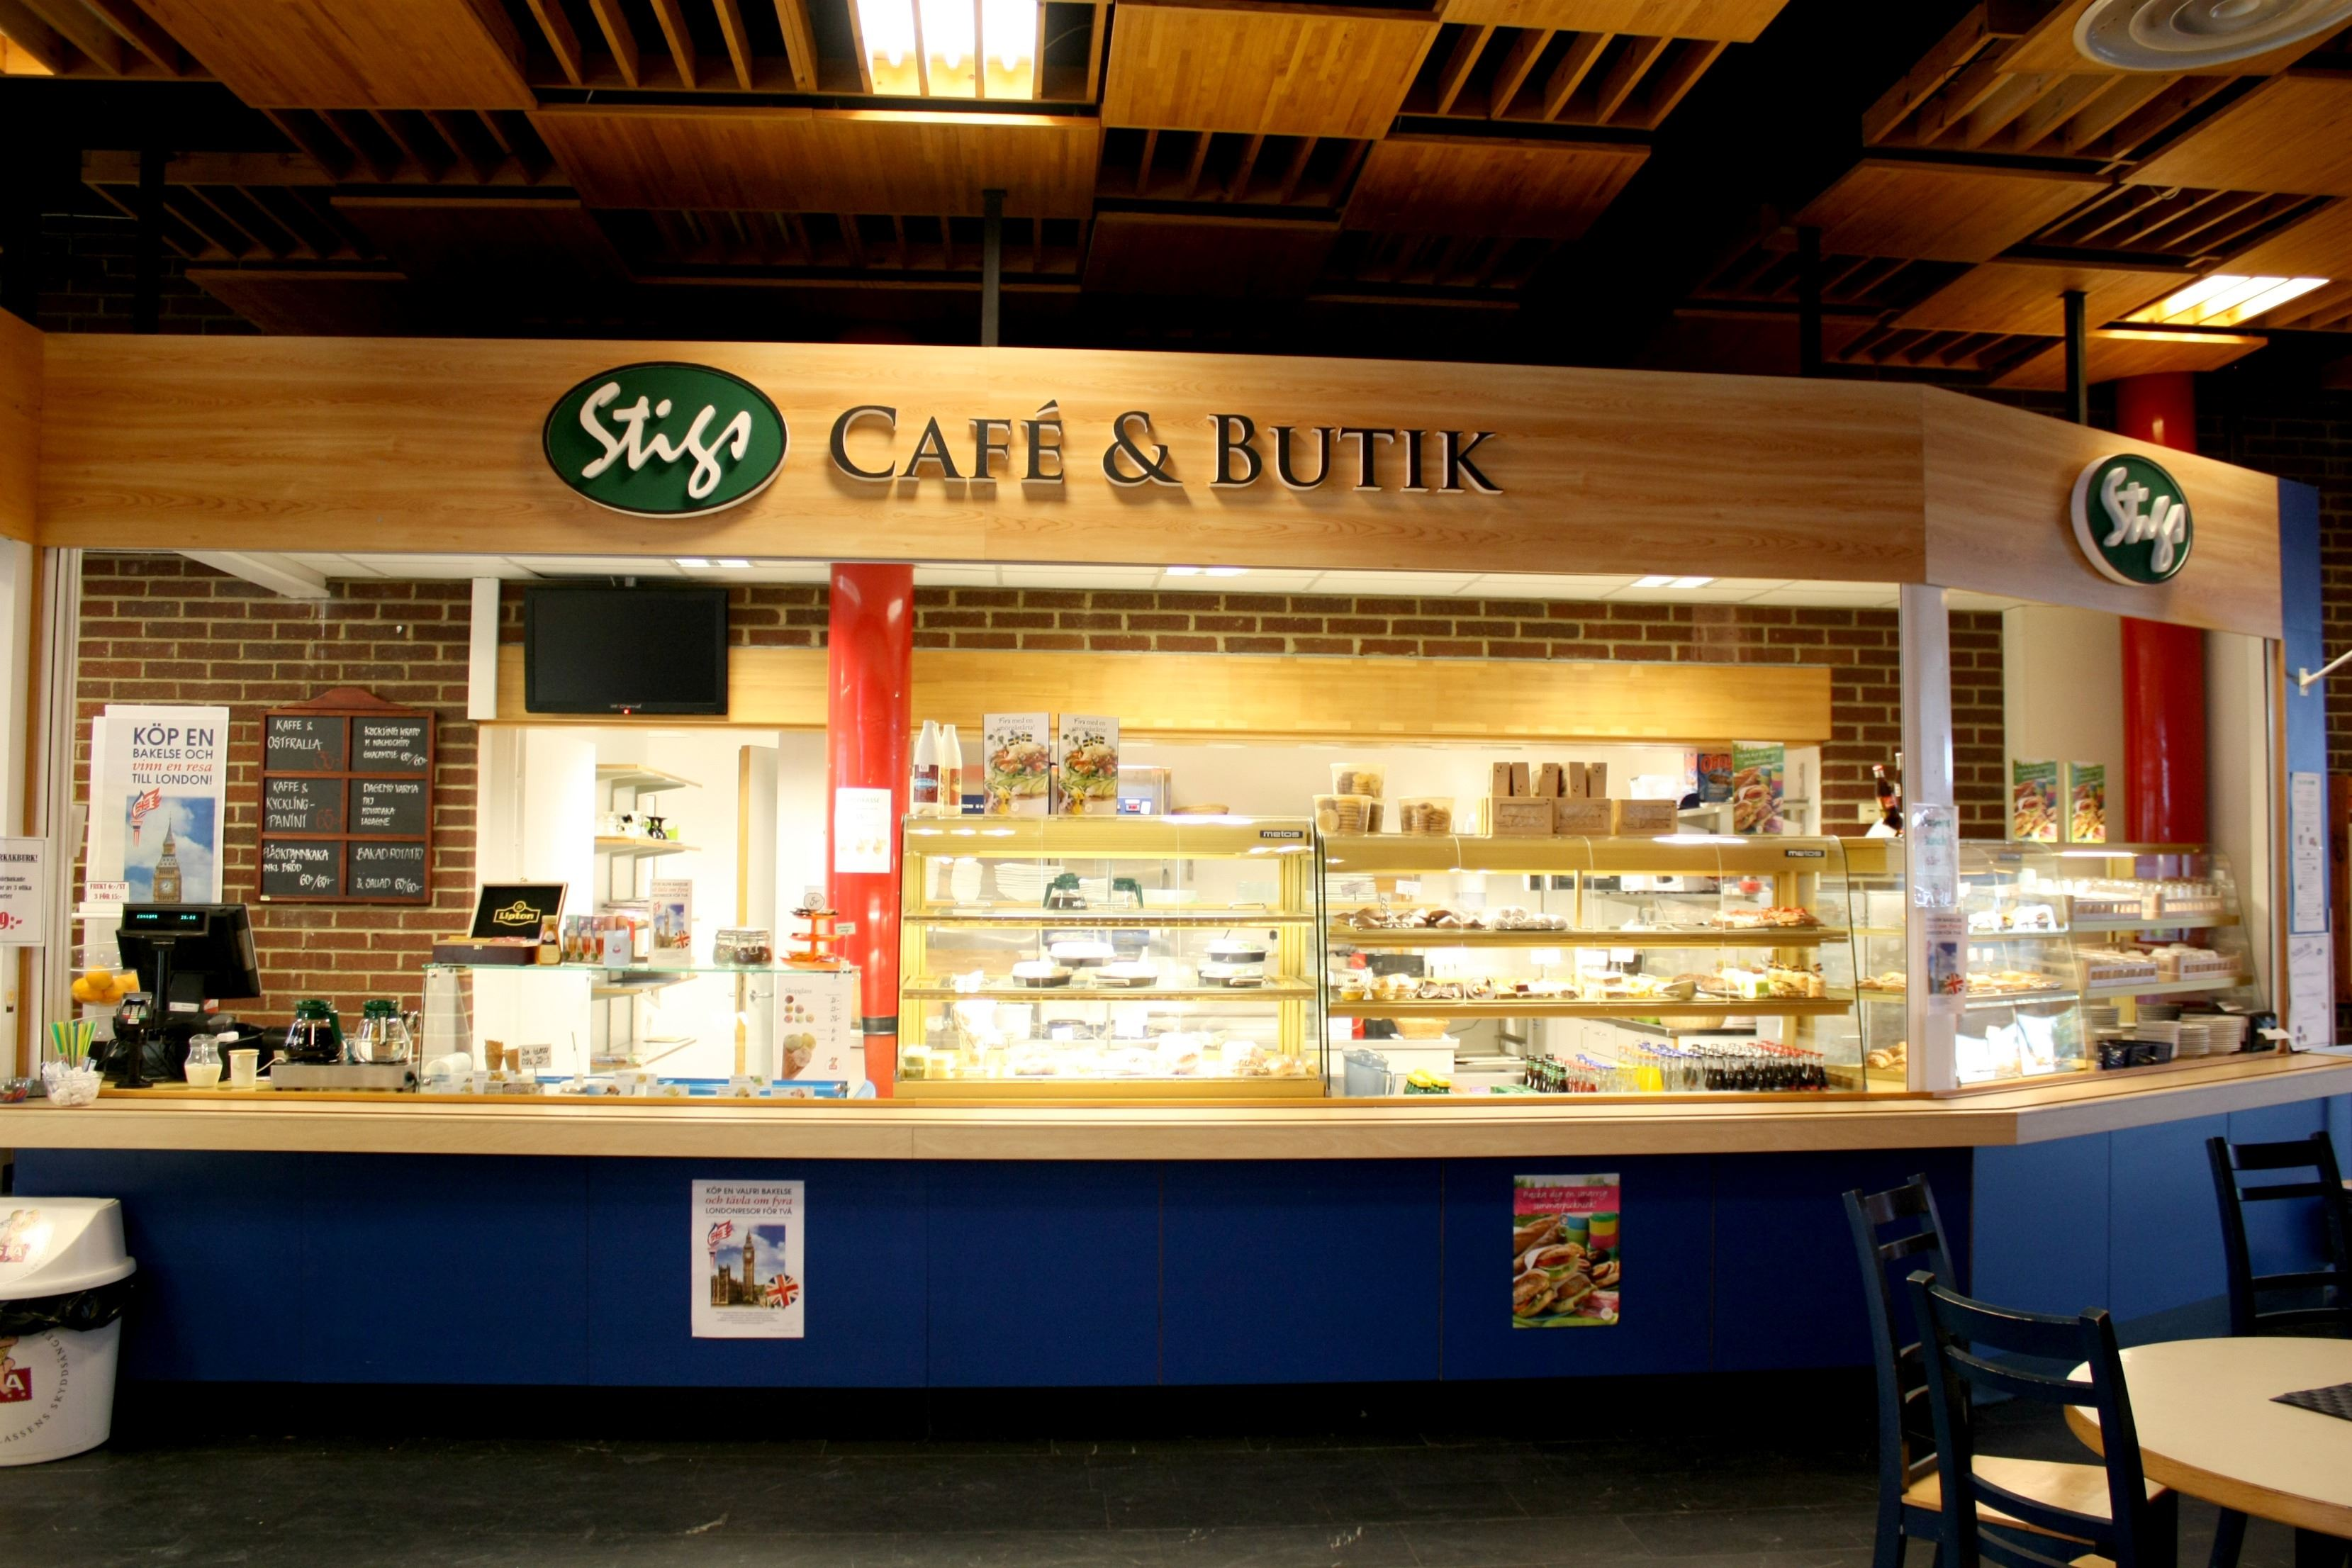 Stigs Café & Butik